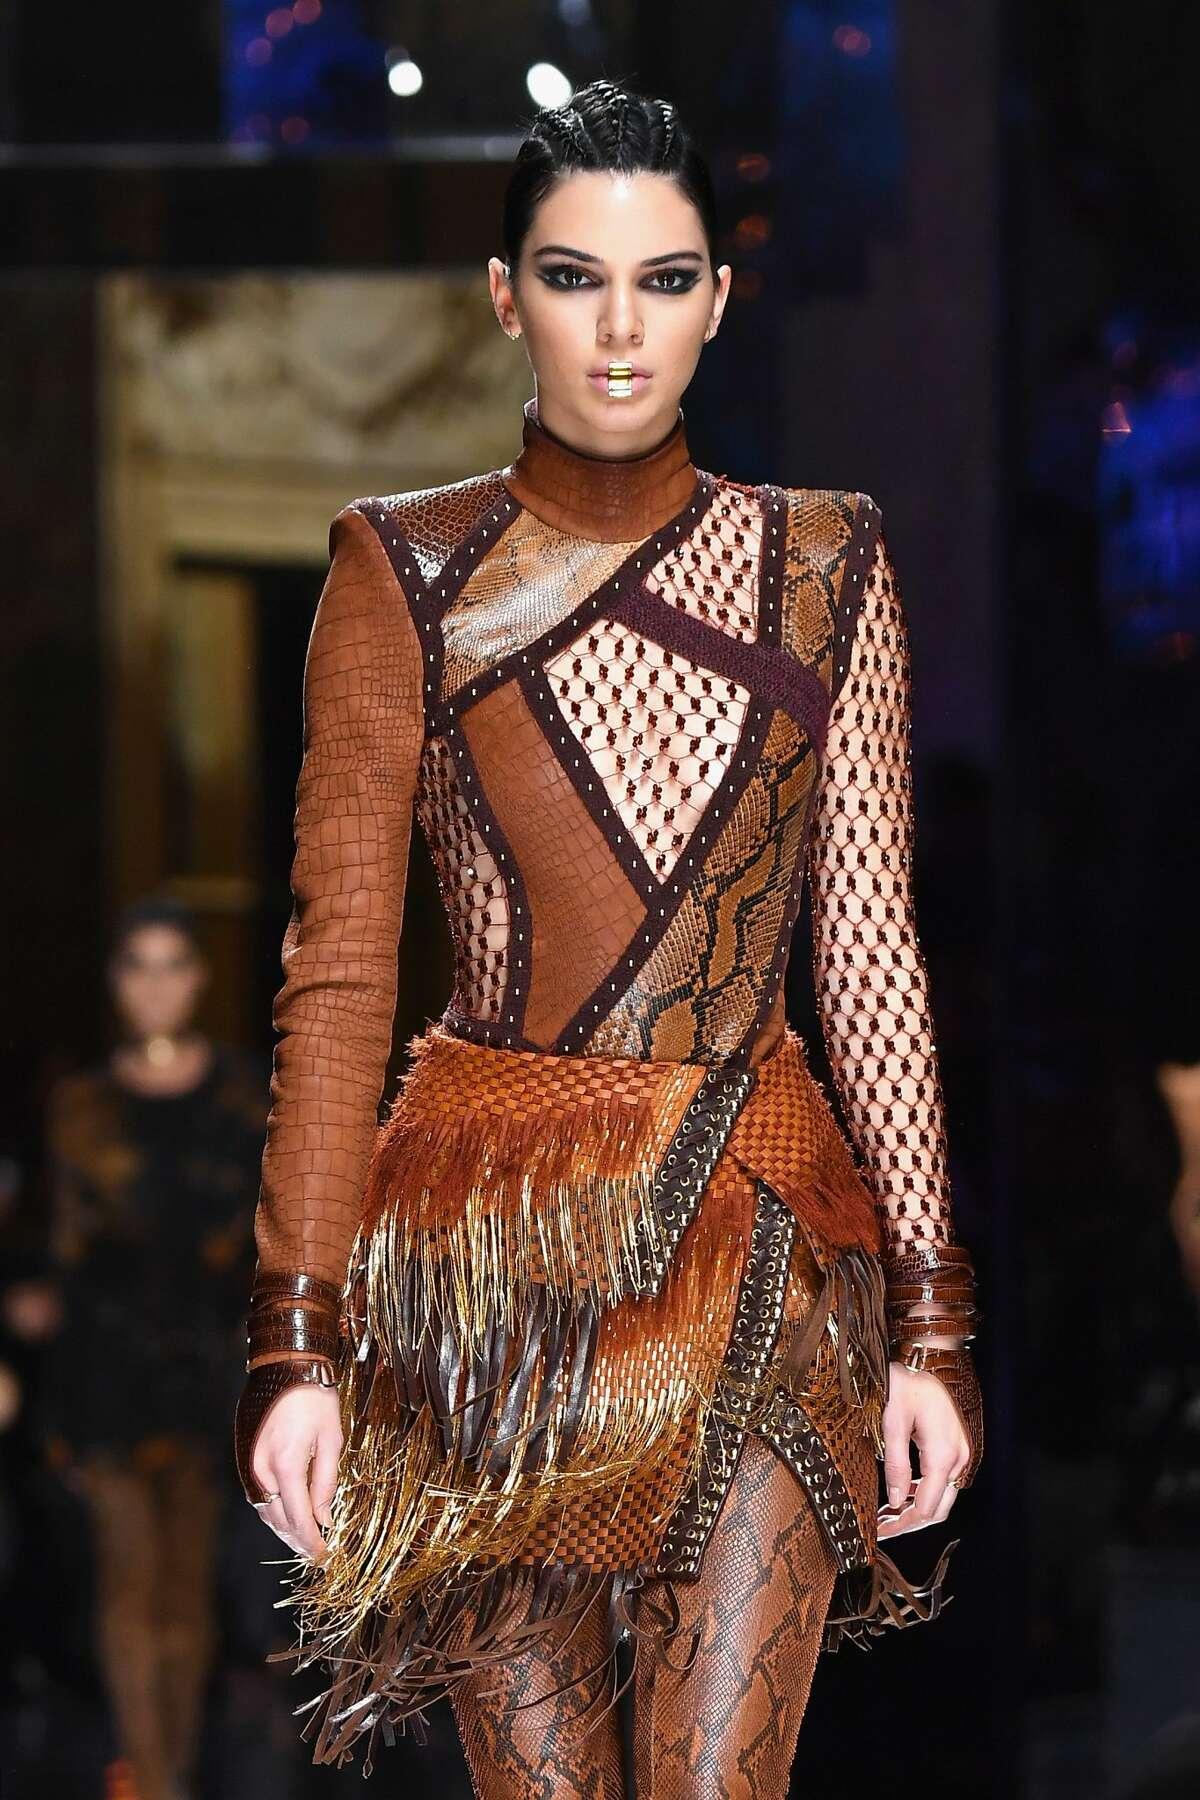 Kendall Jenner walks the runway during the Balmain show as part of the Paris Fashion Week Womenswear Fall/Winter 2017/2018.